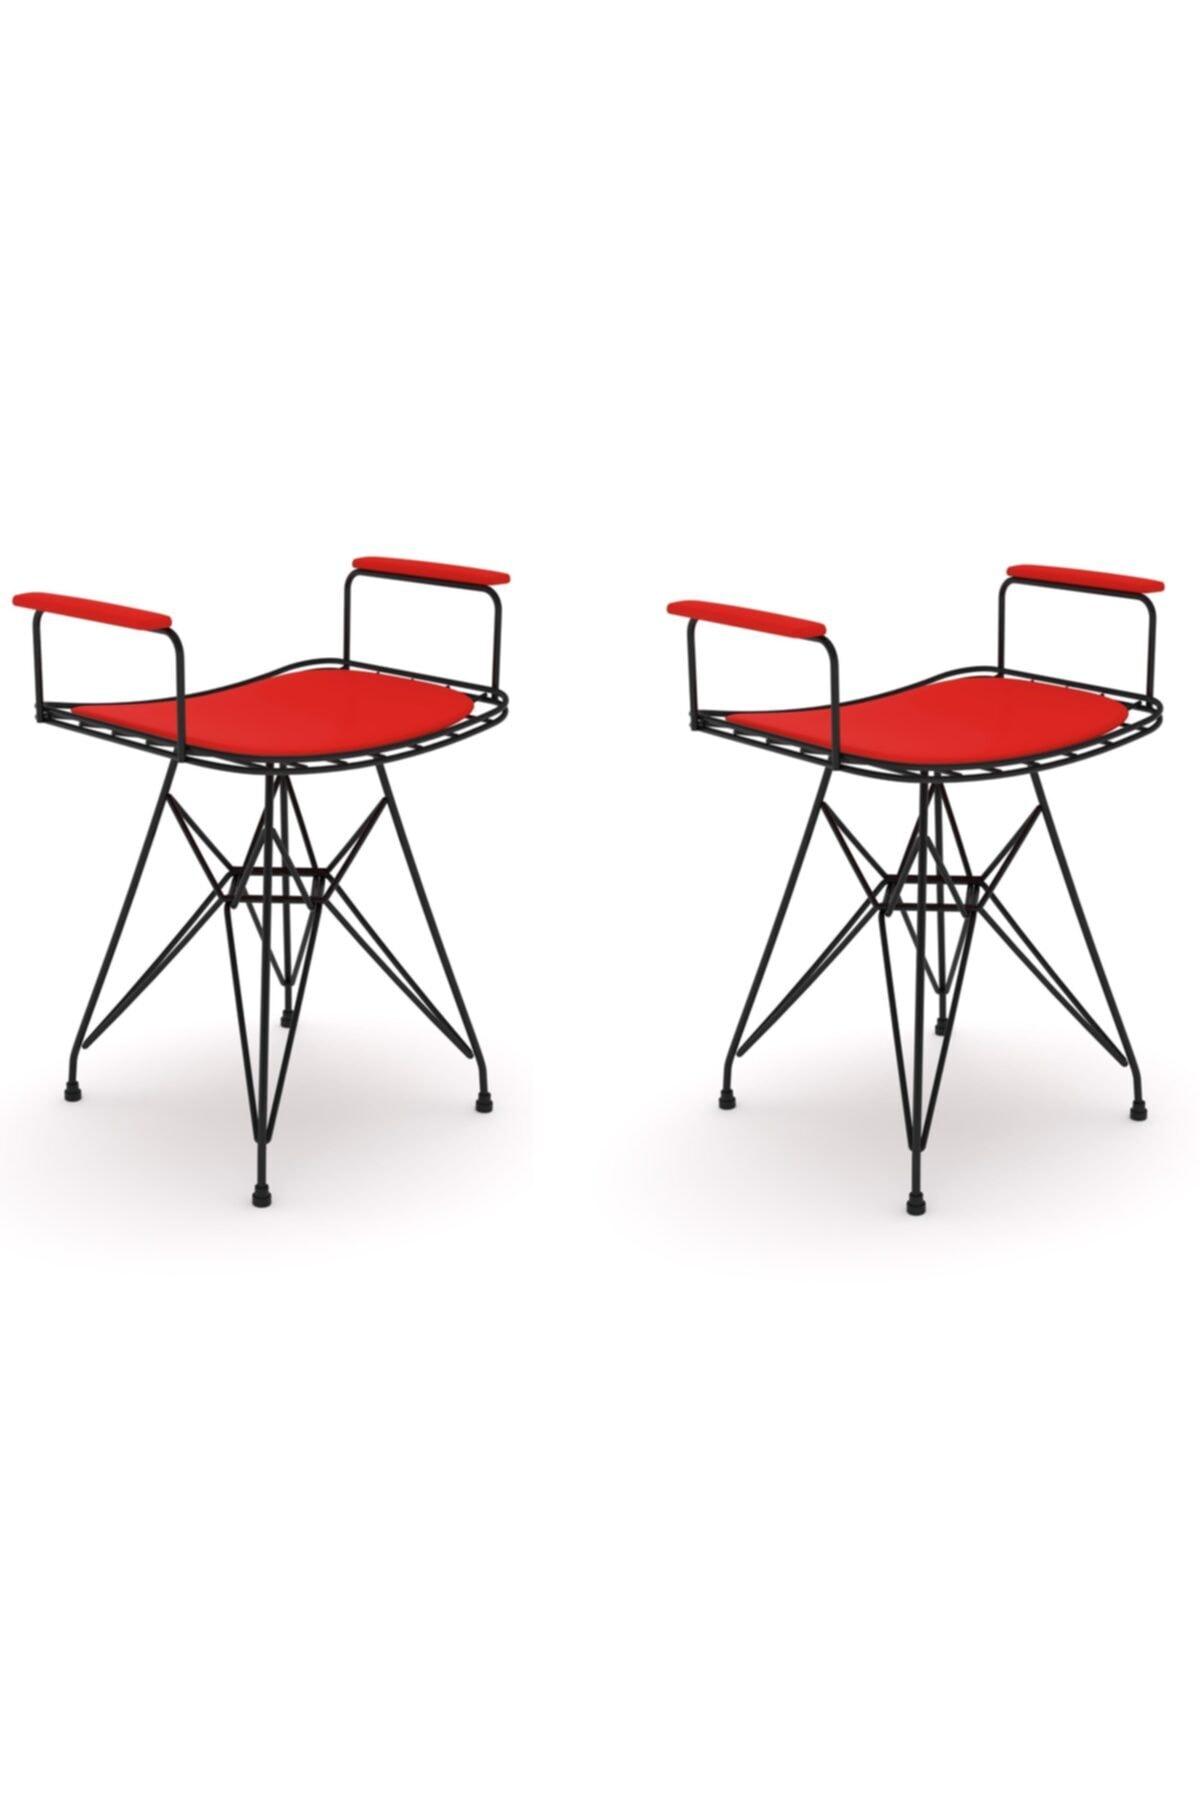 Knsz Kafes Tel Sandalyesi Tabure 2 Li Mutlu Syhkrm Kolçaklı Ofis Cafe Bahçe Mutfak